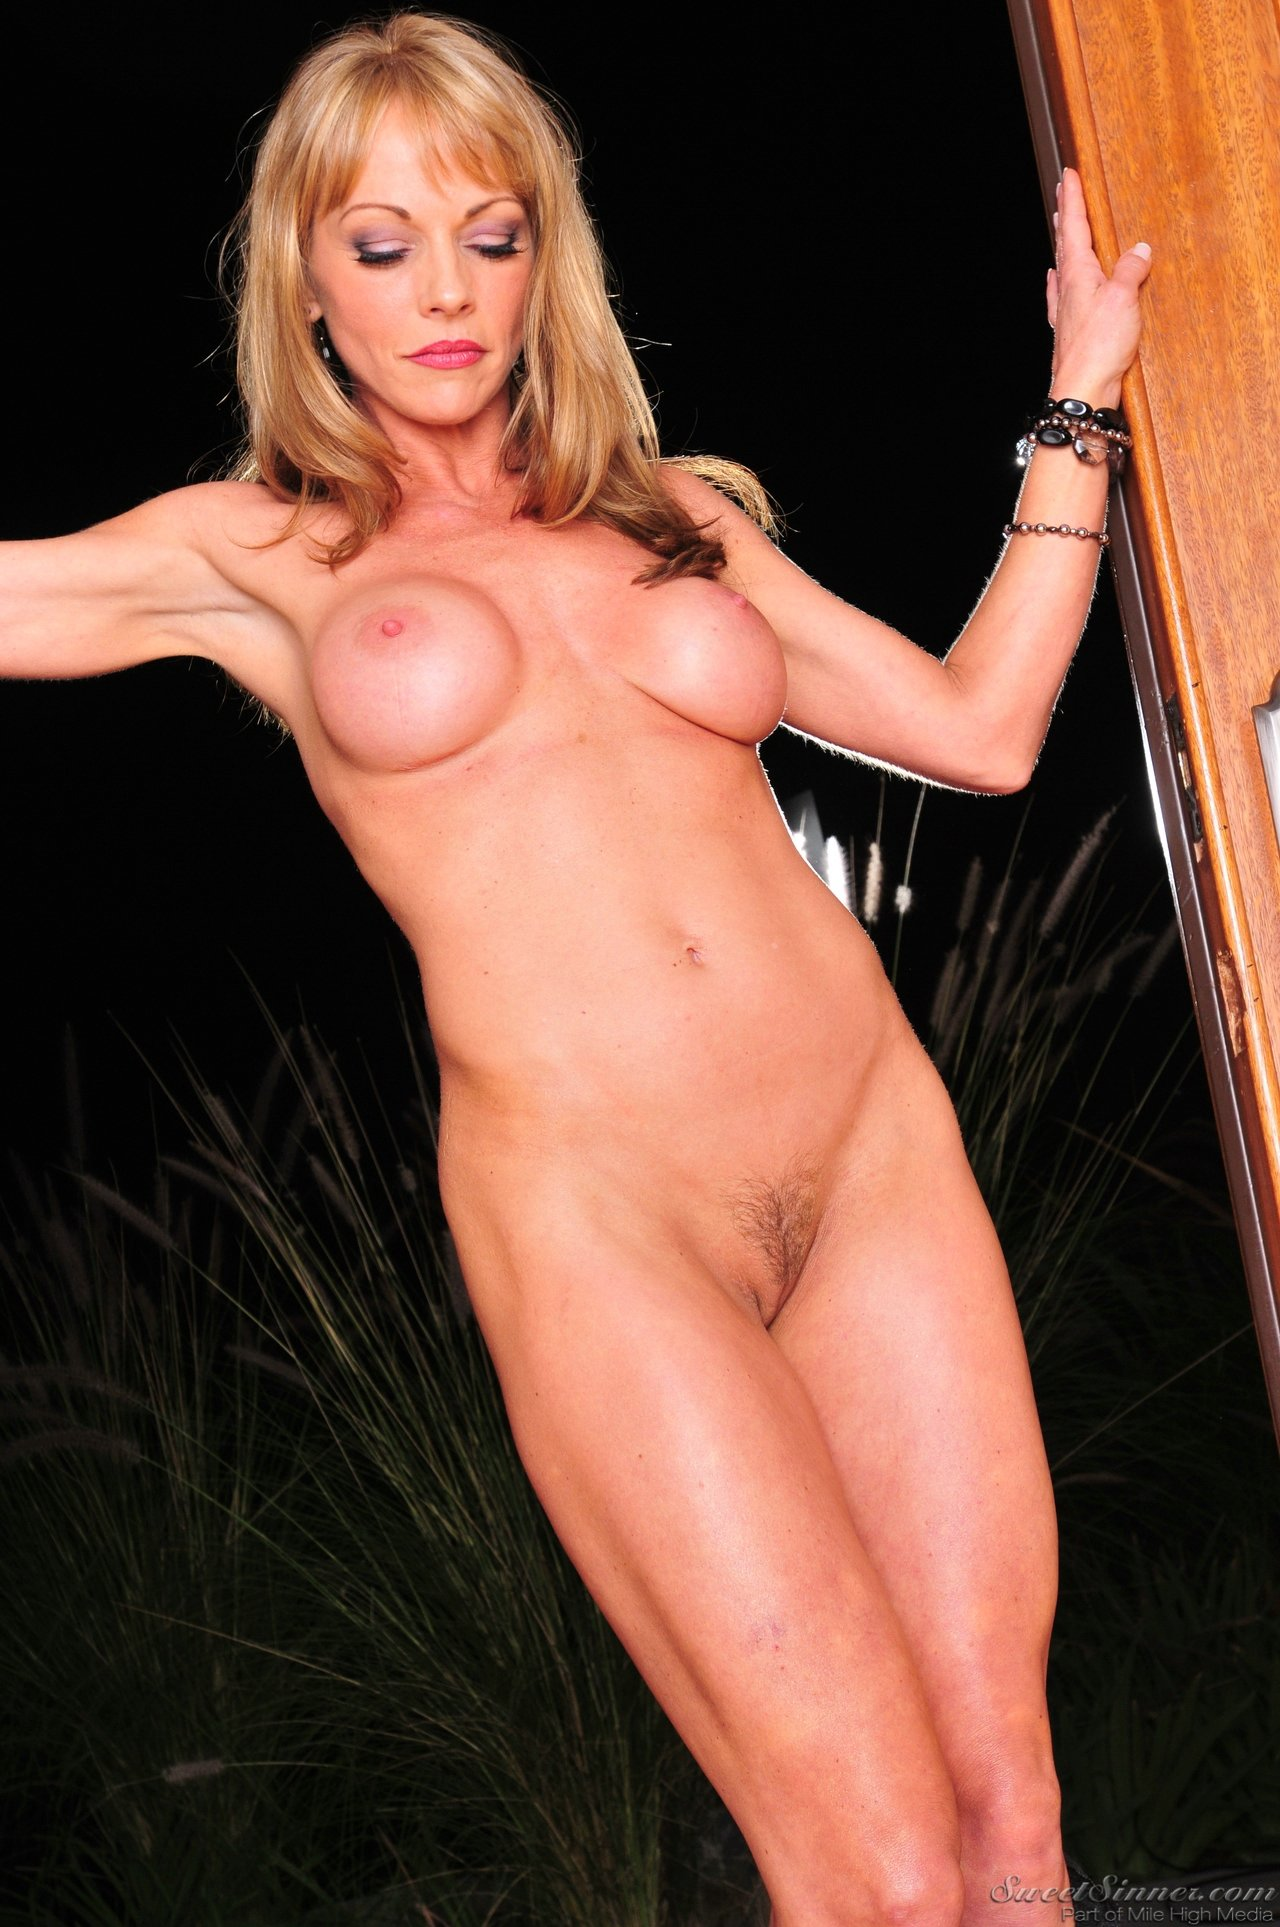 Blonde milf shayla in stockings sm65 7